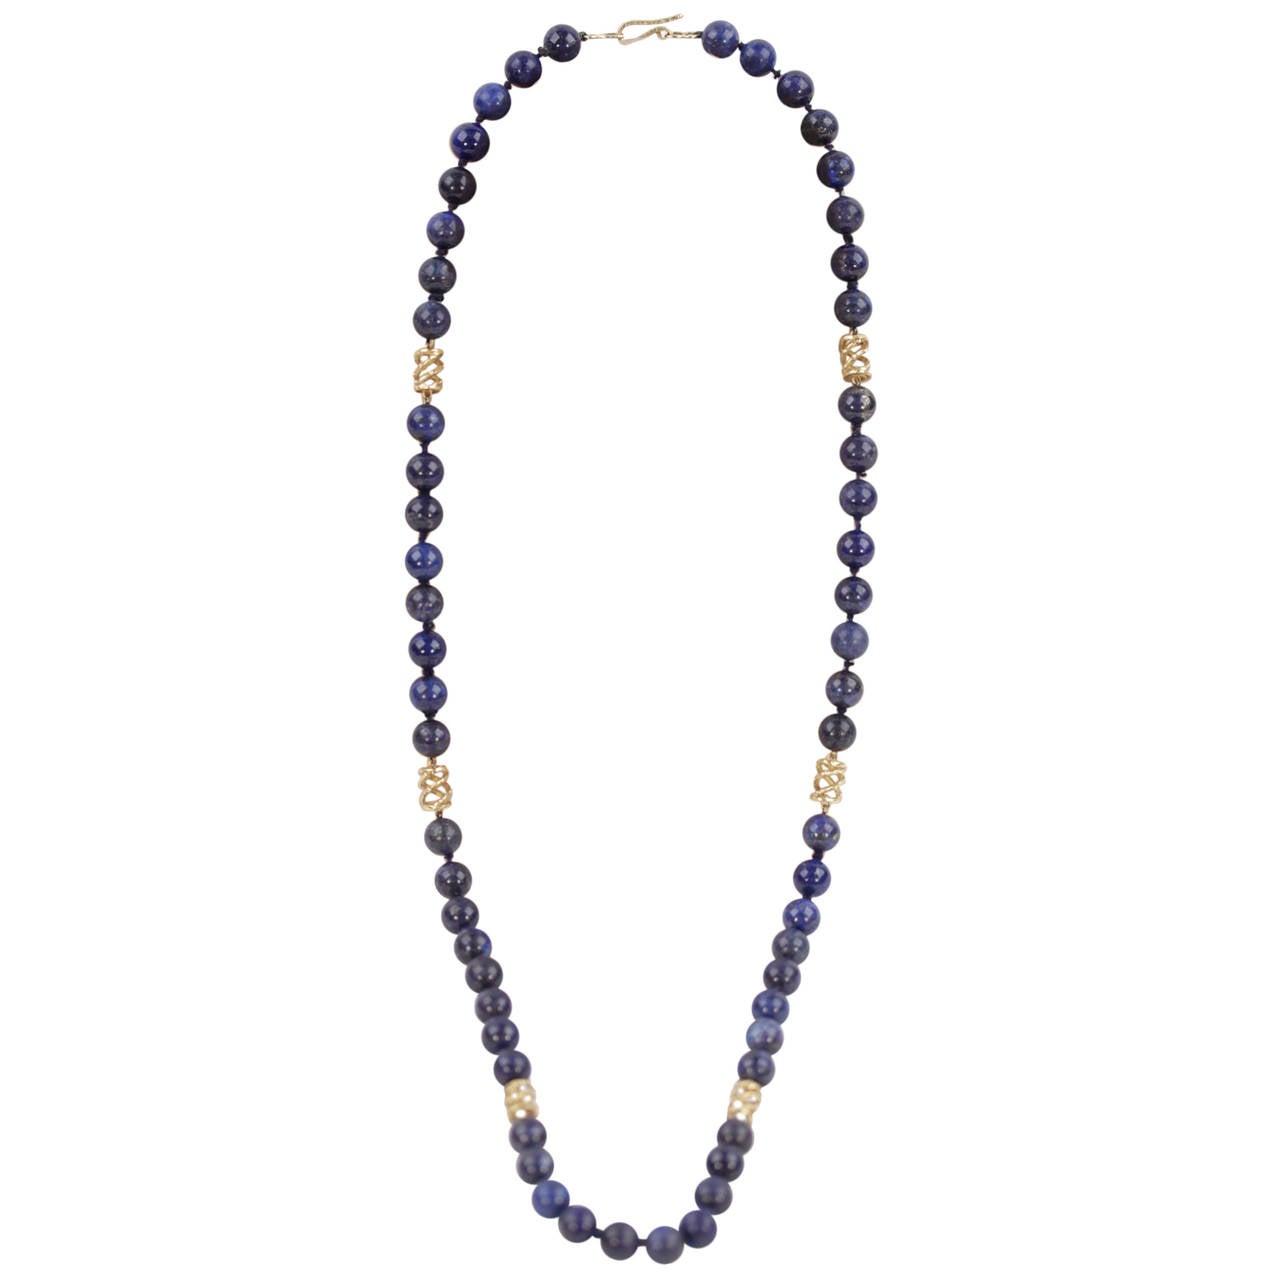 VINTAGE 1970s Blue LAPIS LAZULI GEMSTONE Beads NECKLACE w